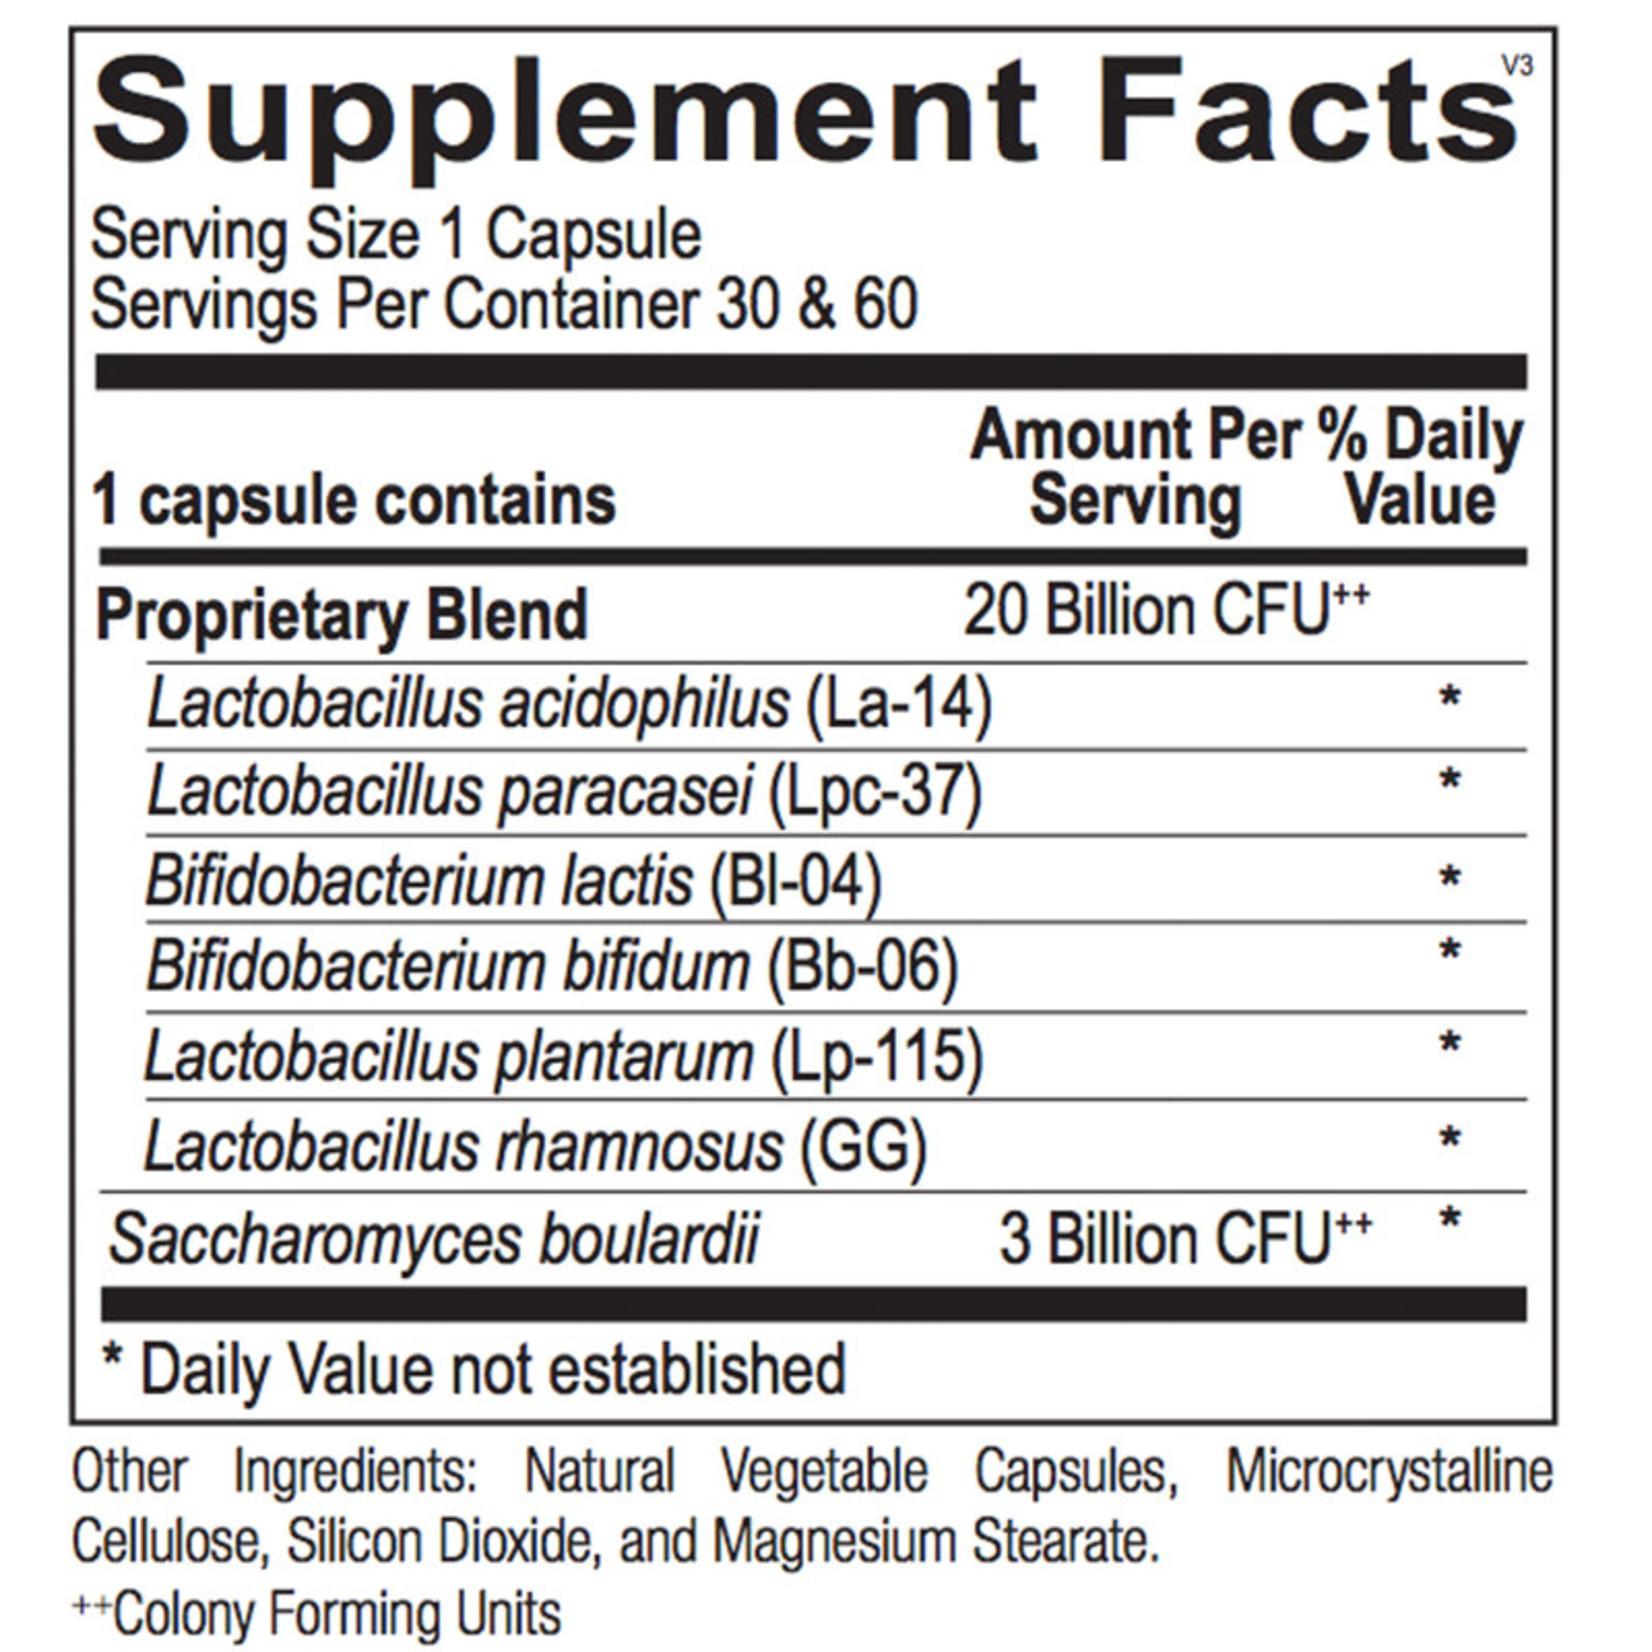 Alpine Clinic Private Label Probiotic w/ S. Boulardii